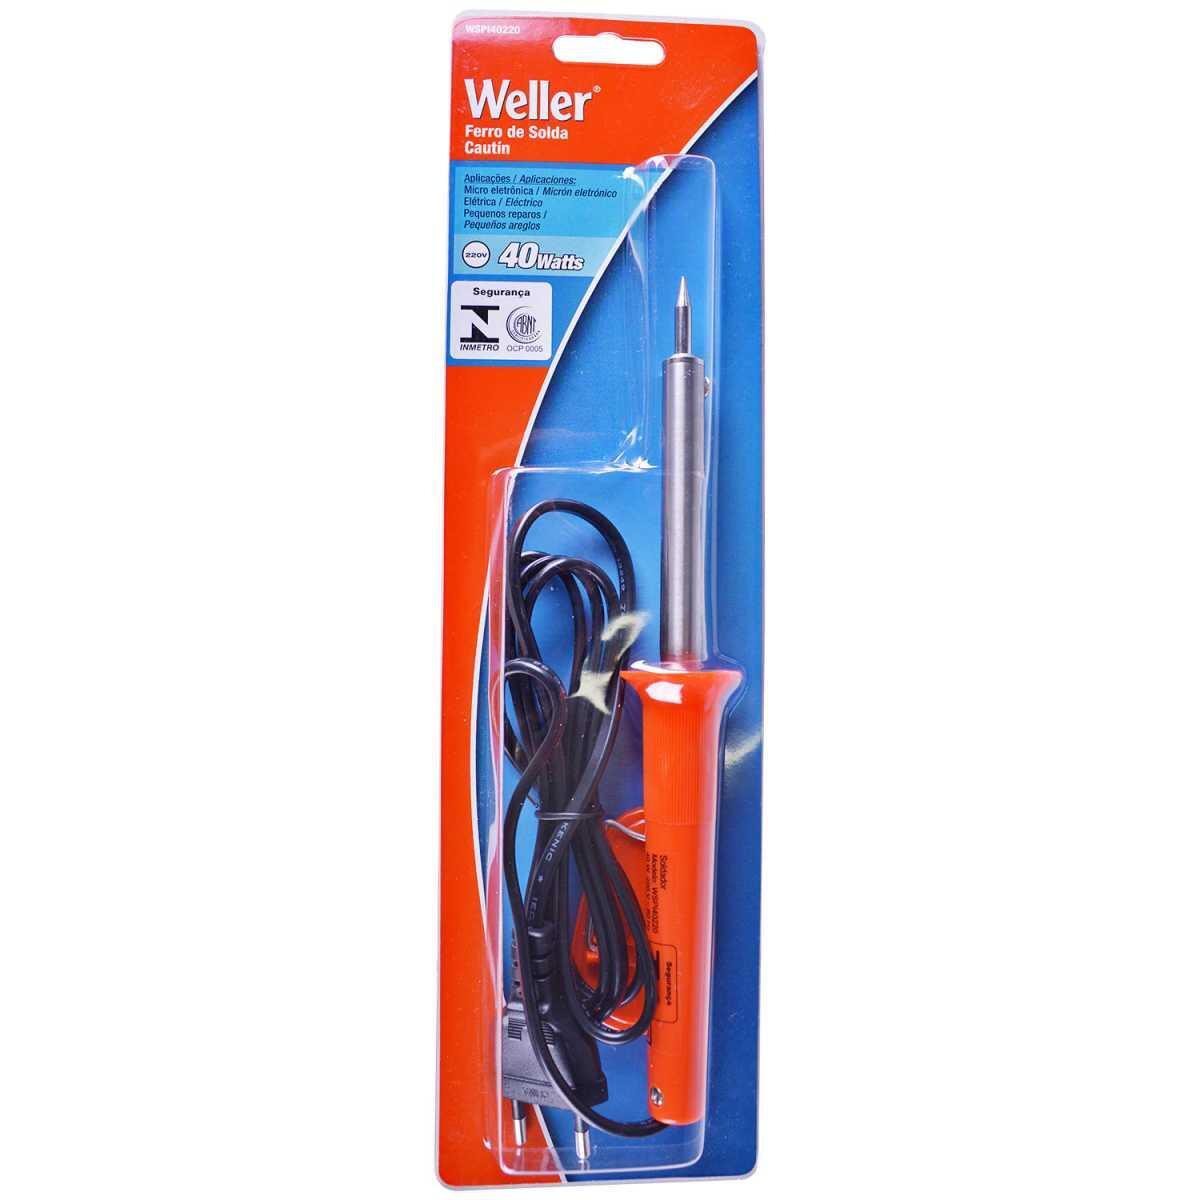 Ferro de Solda 40Watts 220V Weller Wspi40220